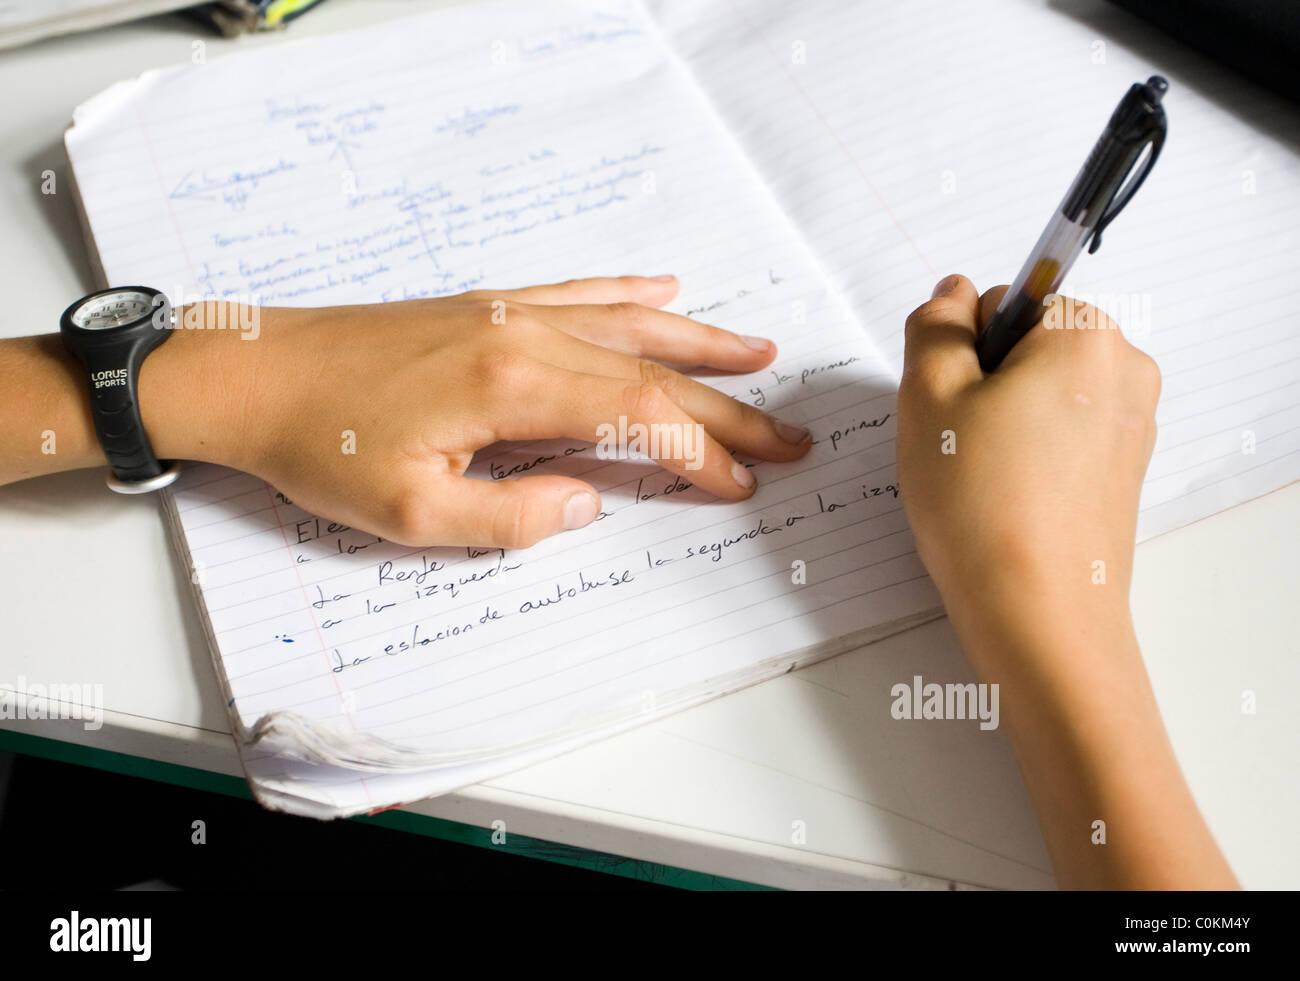 A pupil fills in a textbook at Maidstone Grammar school in Maidstone, Kent, U.K. - Stock Image